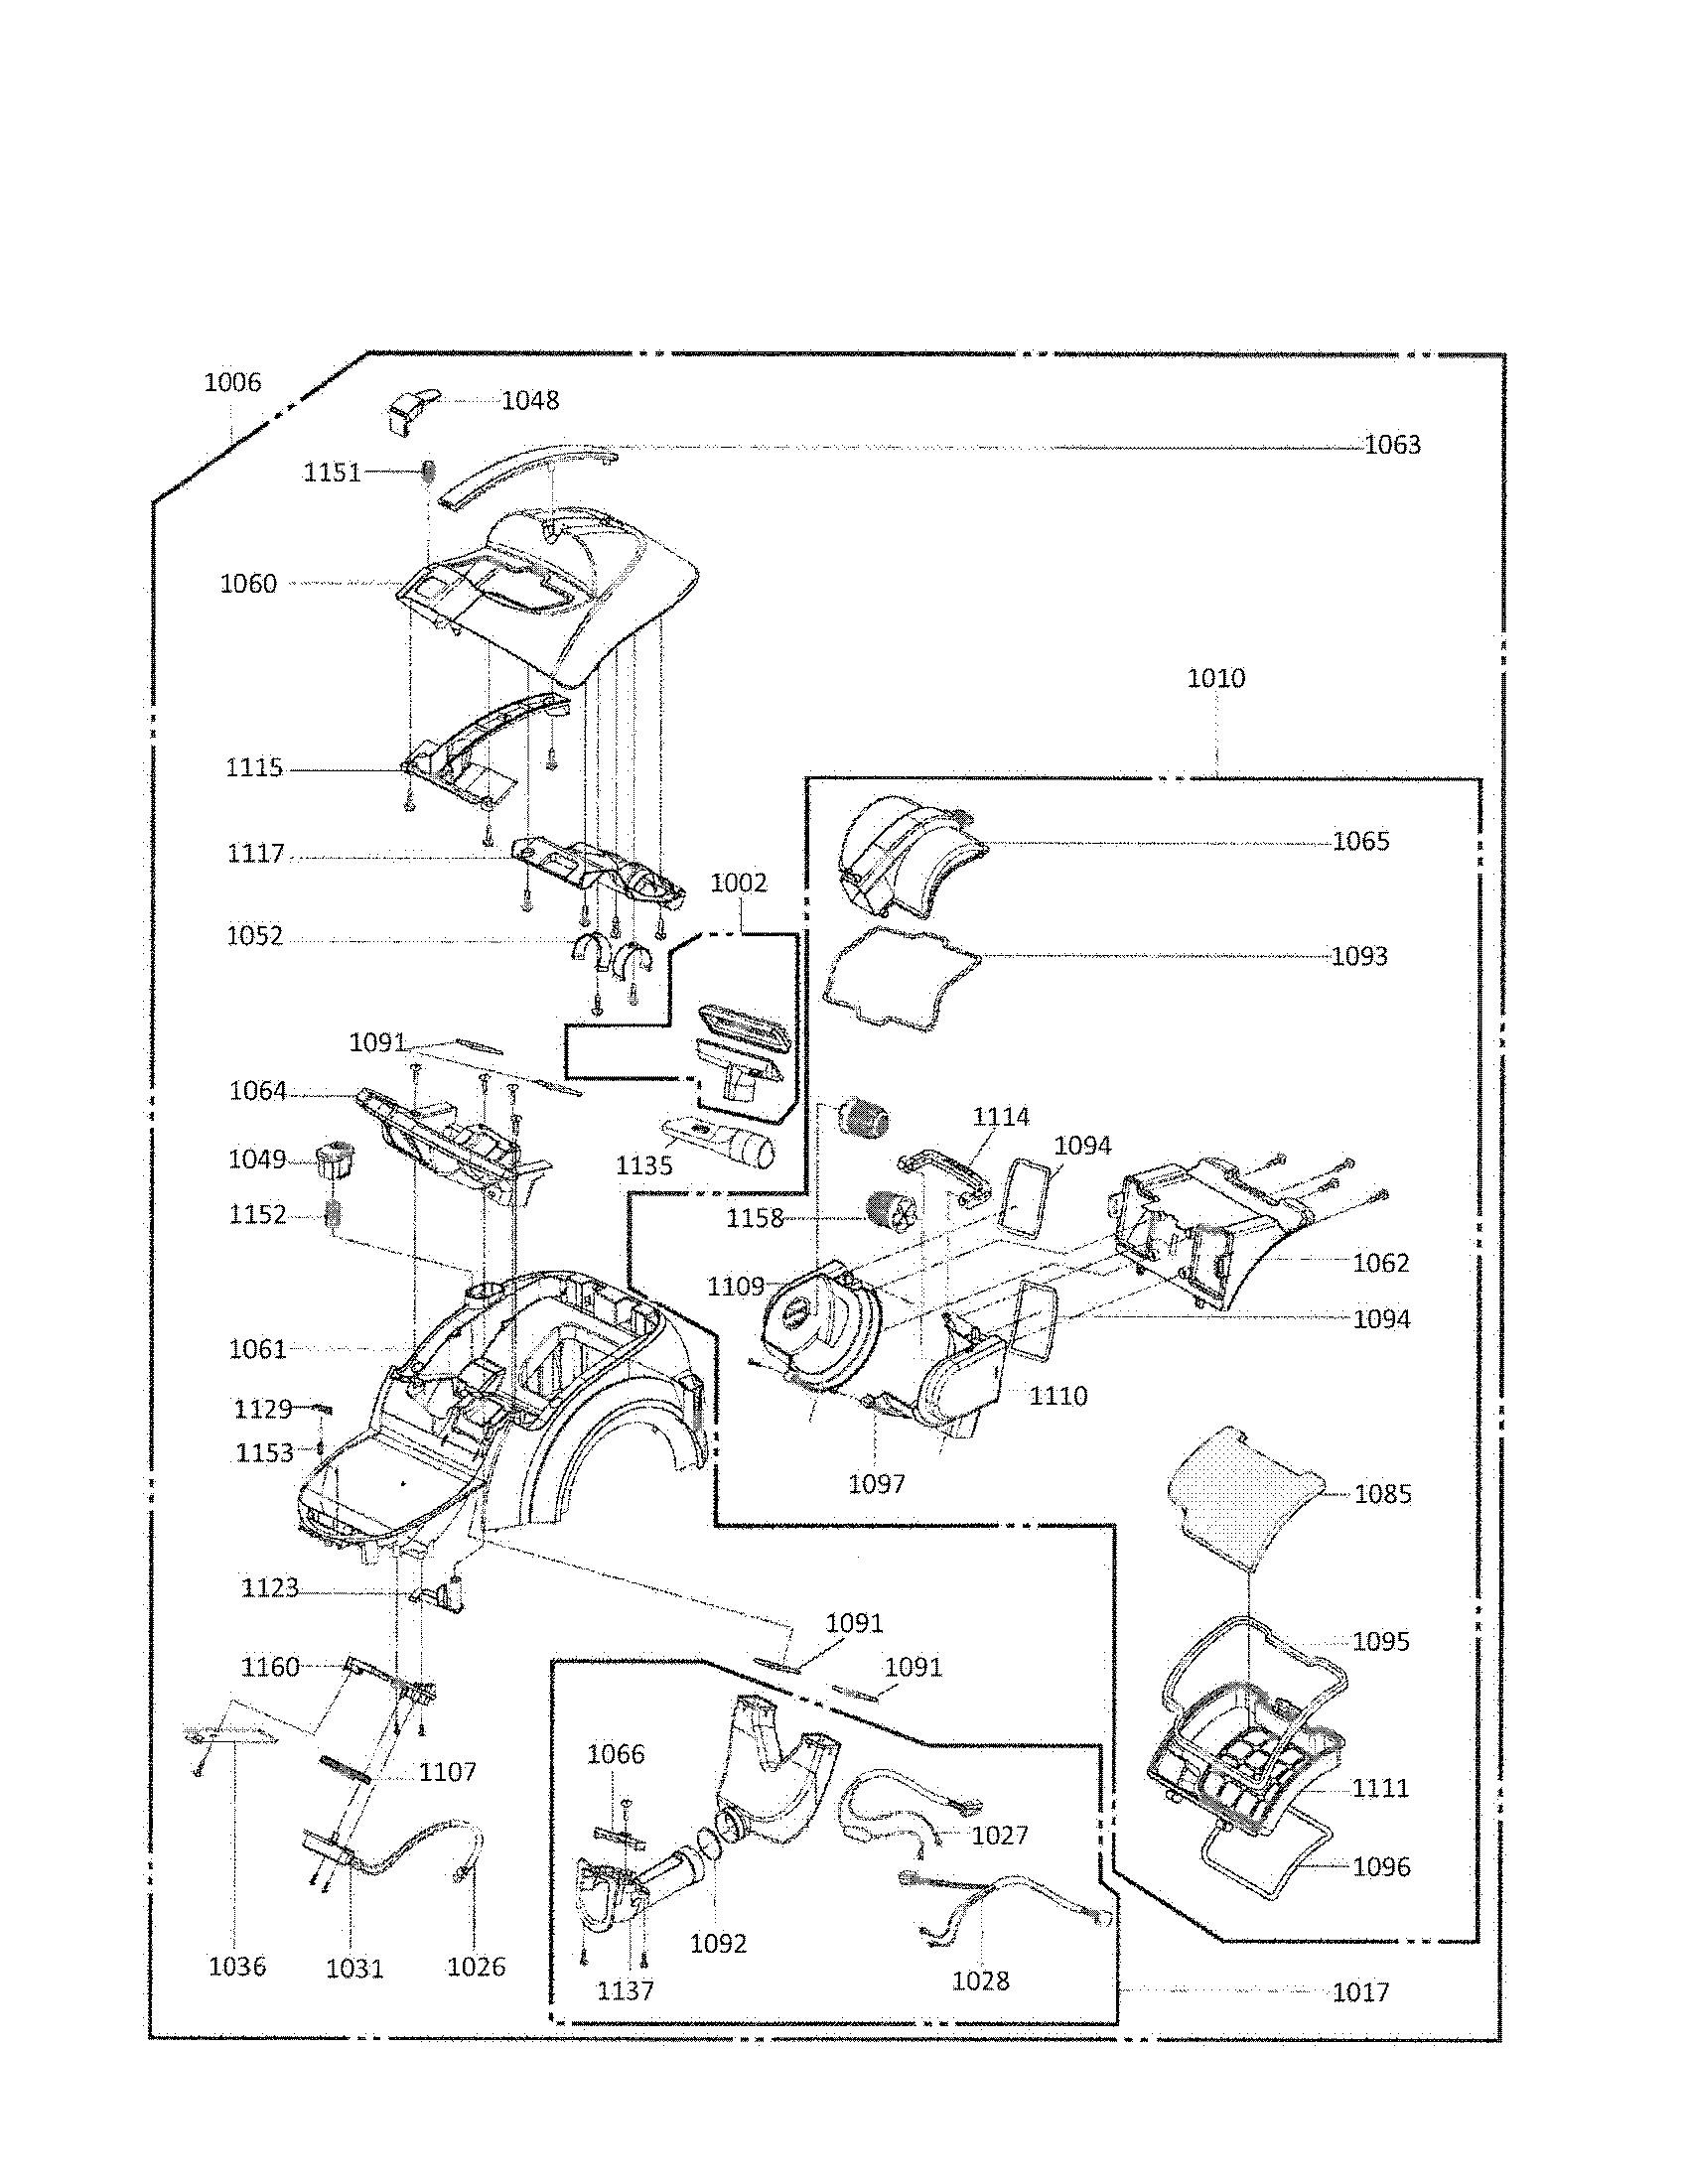 Dyson Dc14 Parts Diagram My Wiring Diagram